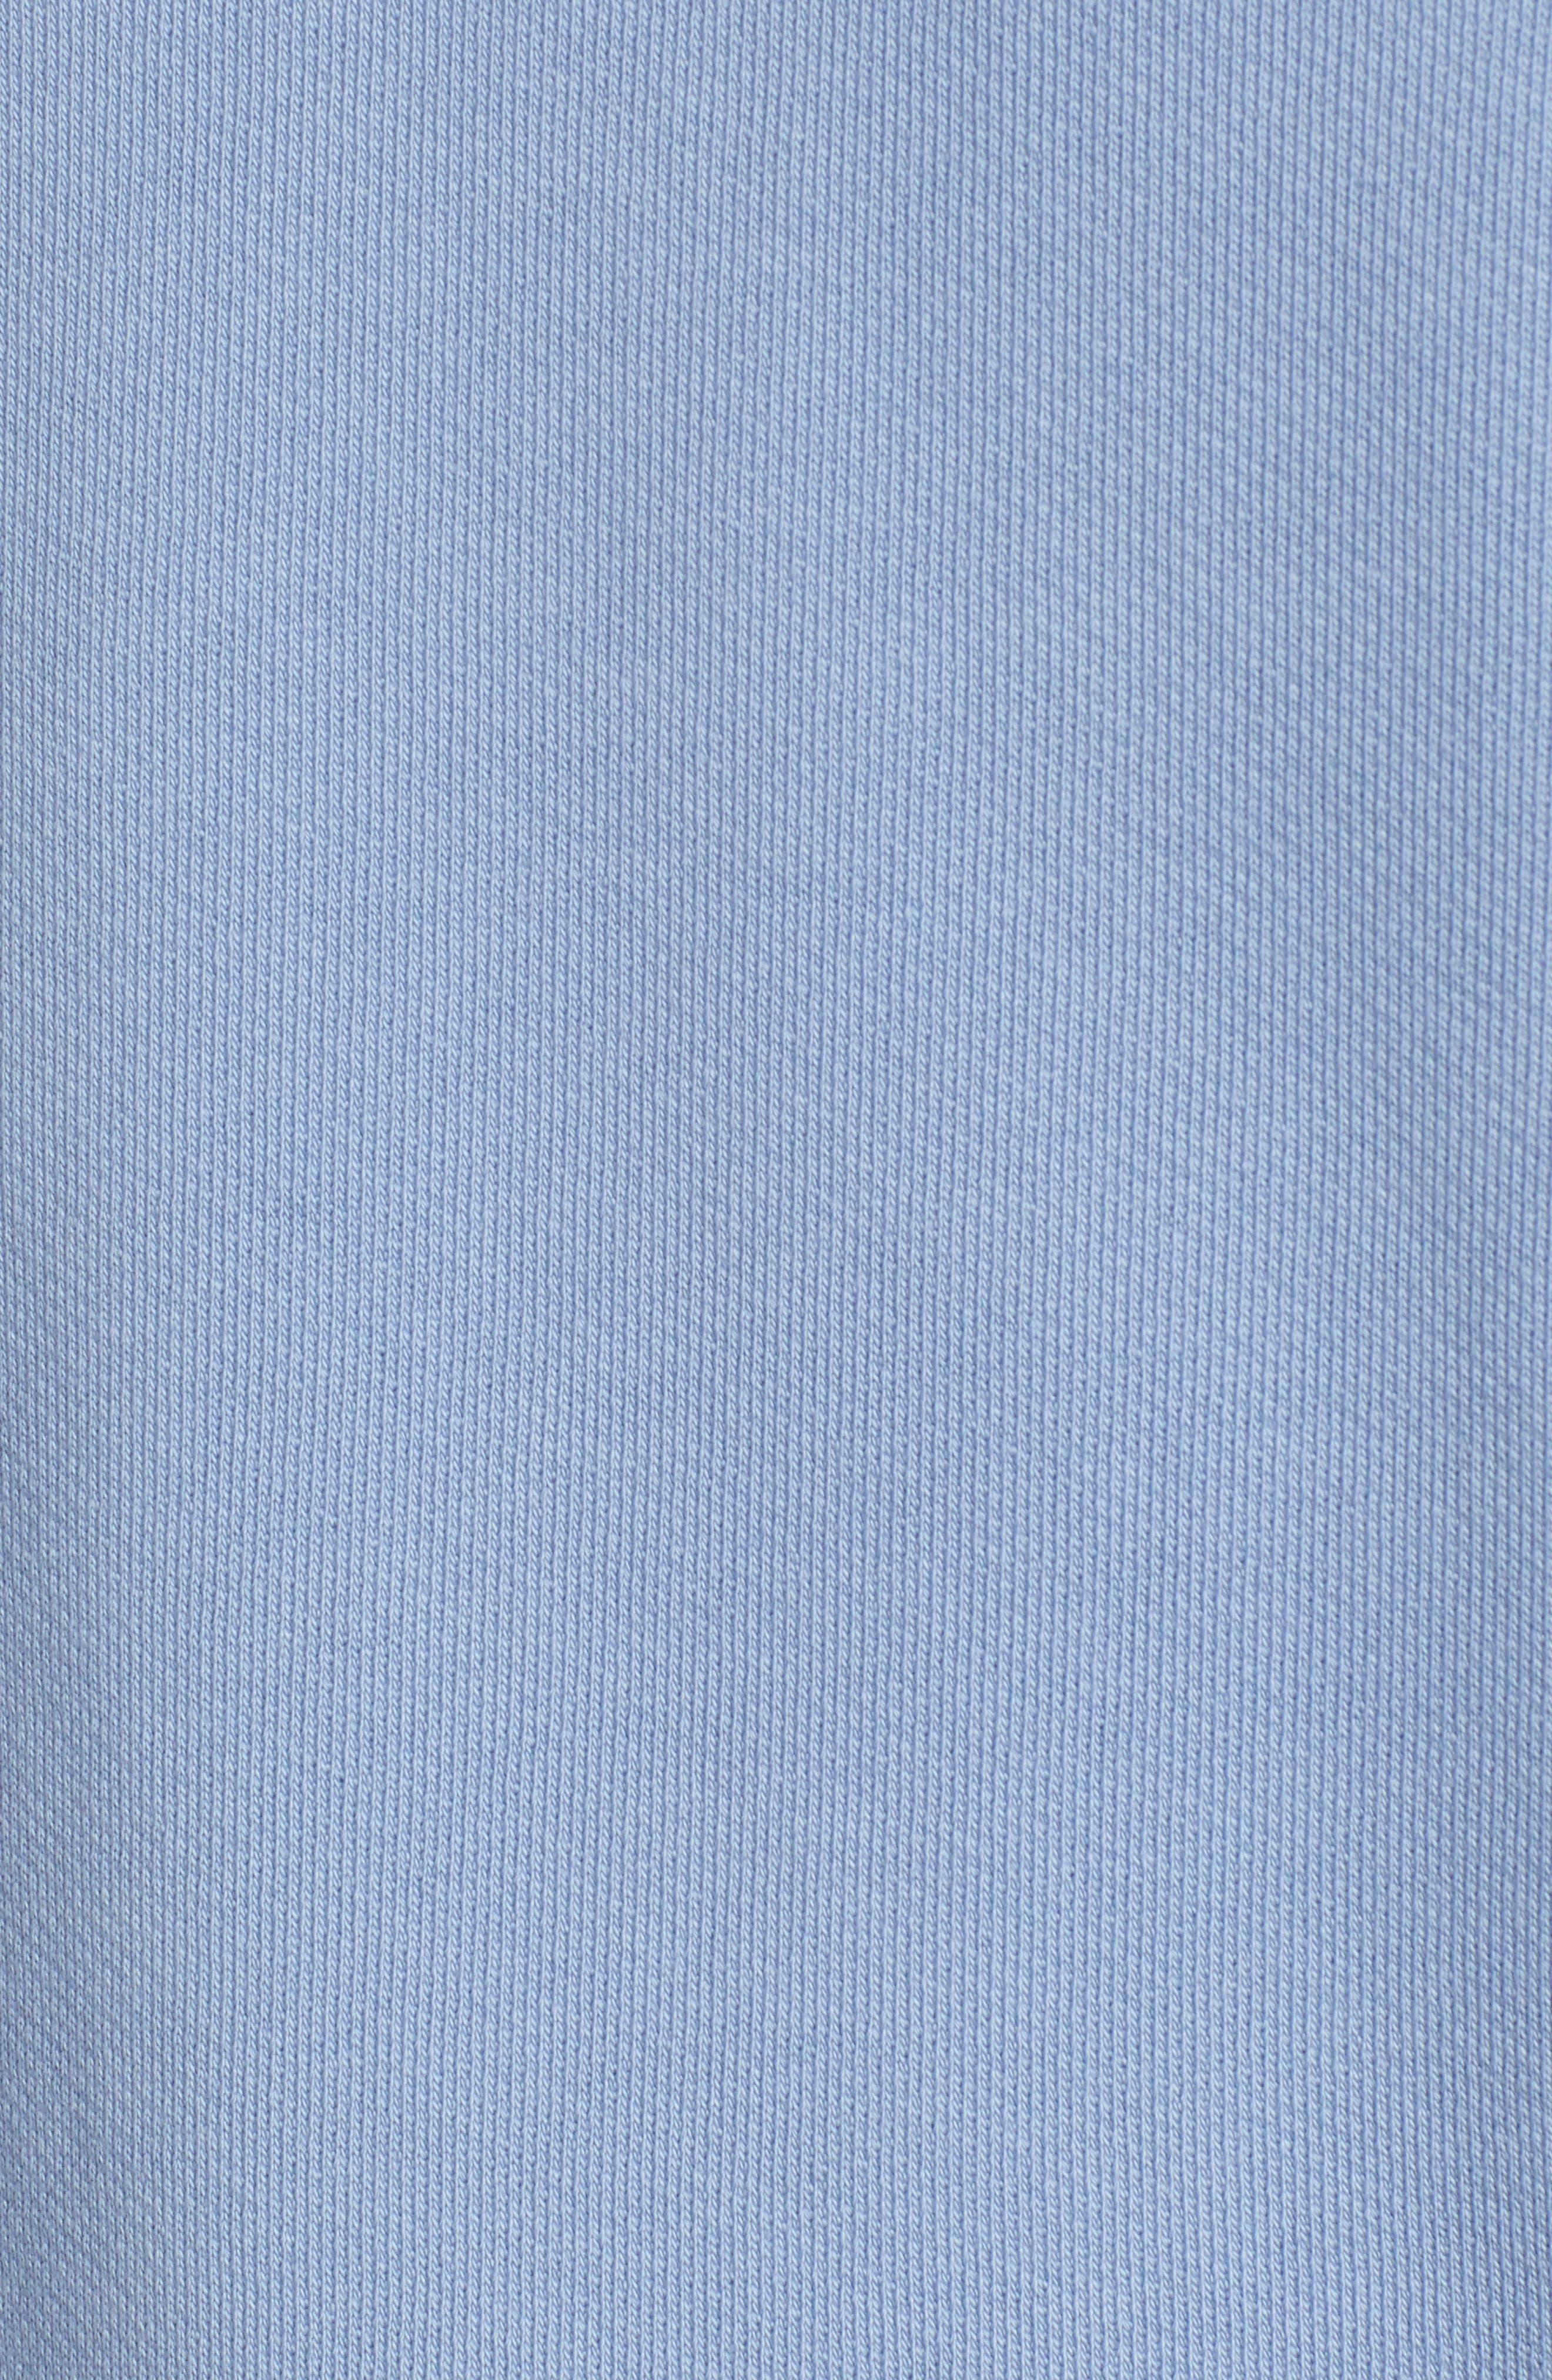 Cotton Terry Sweatshirt,                             Alternate thumbnail 9, color,